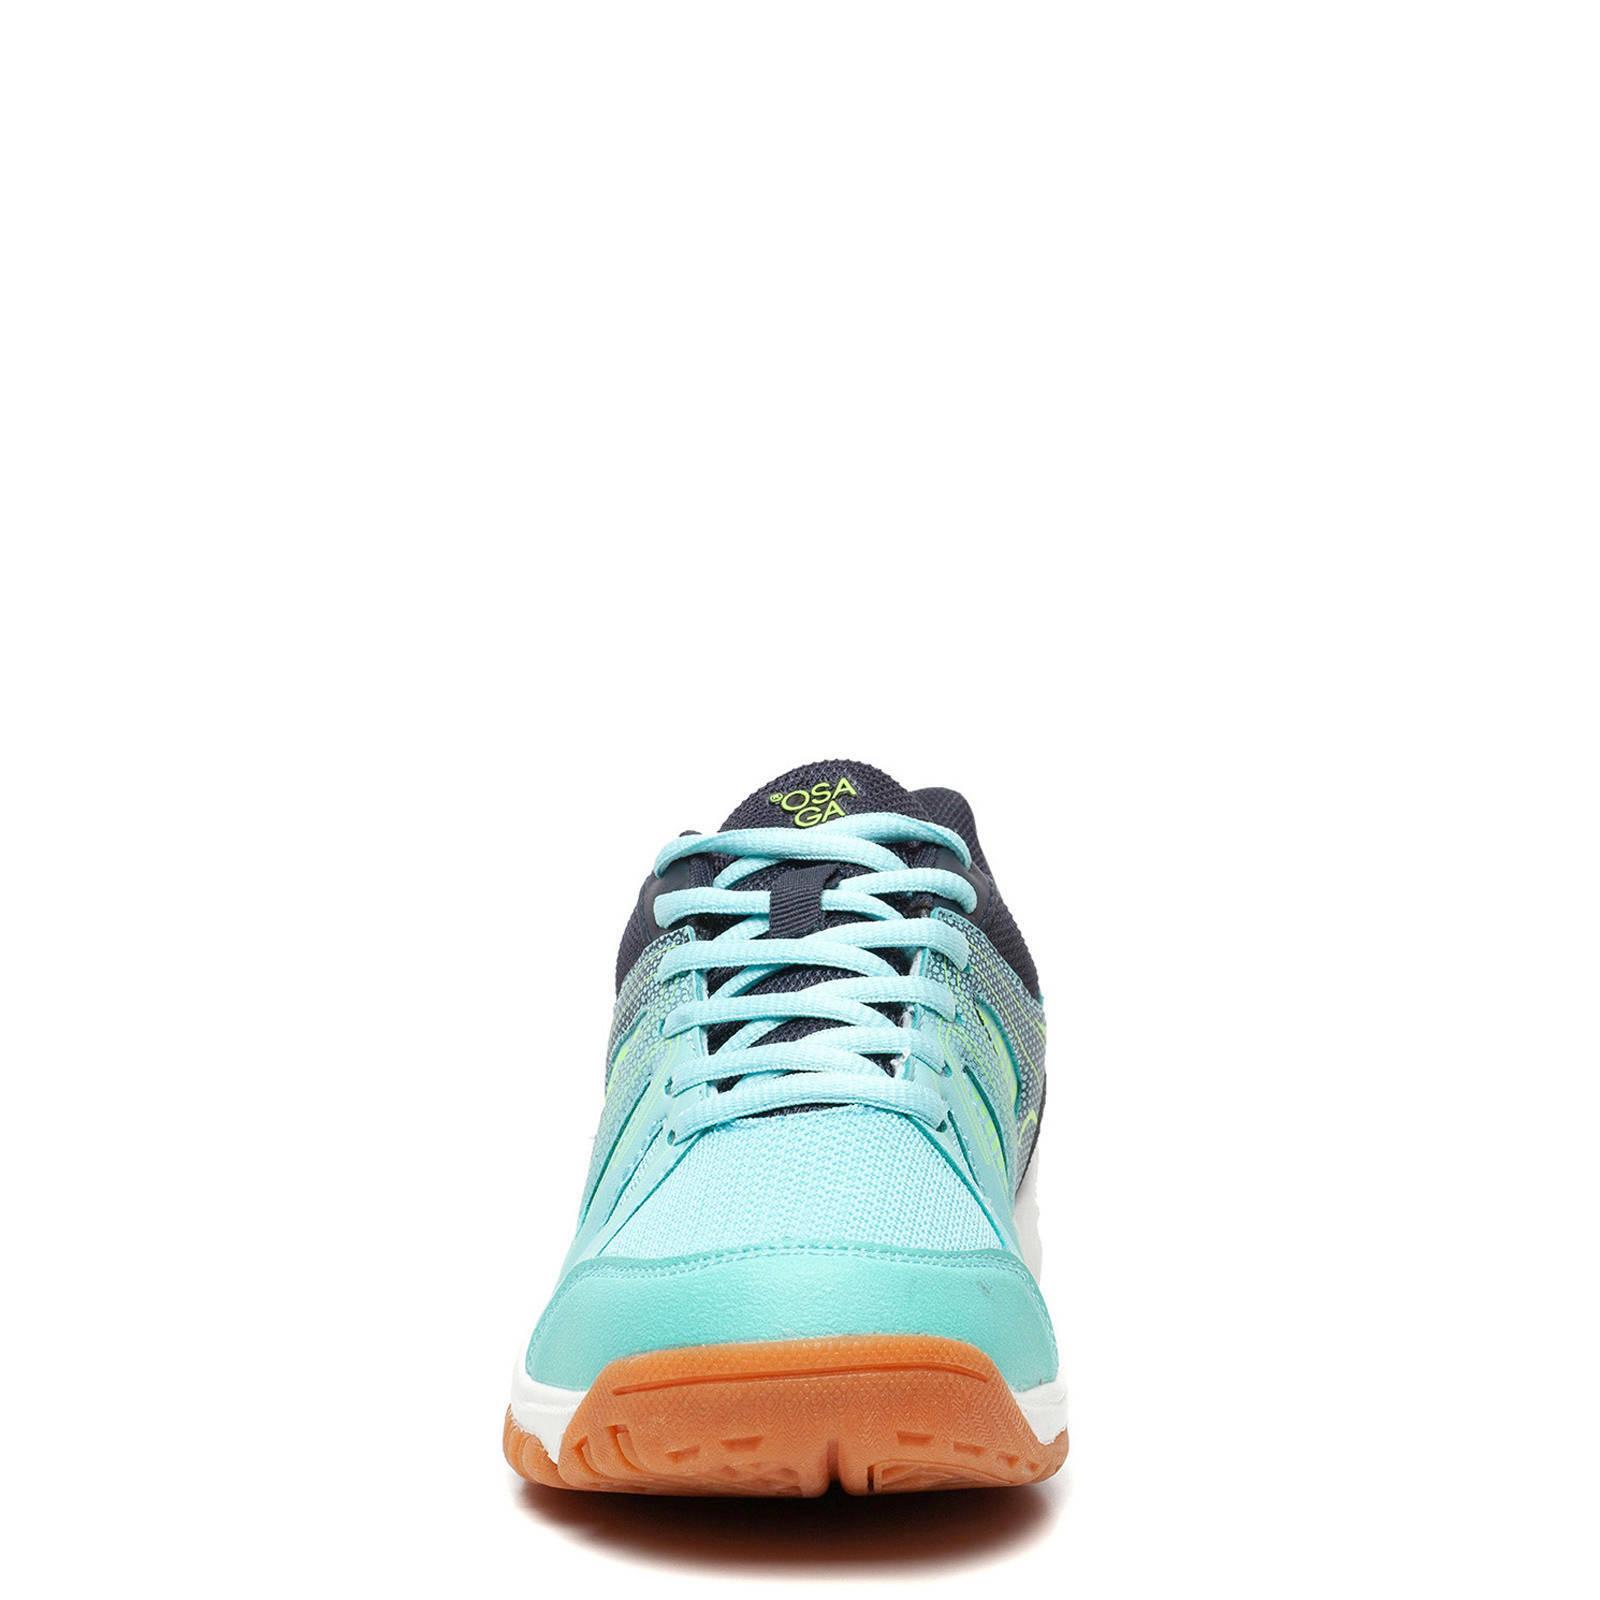 Scapino Osaga zaalsportschoenen mintgroen | wehkamp